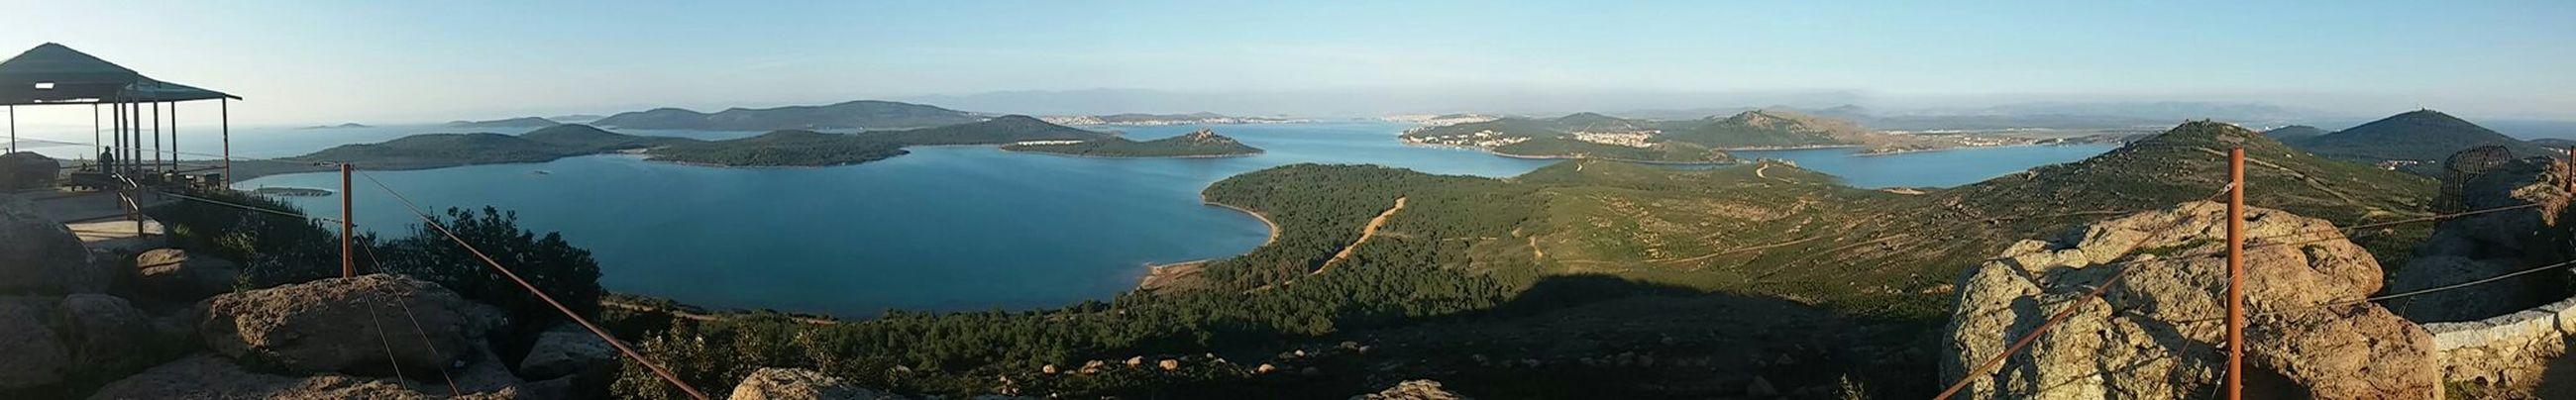 Ayvalik Seytansofrasi Footprints Balikesir Cunda Traveling Scenery Sea Panoramic Photography